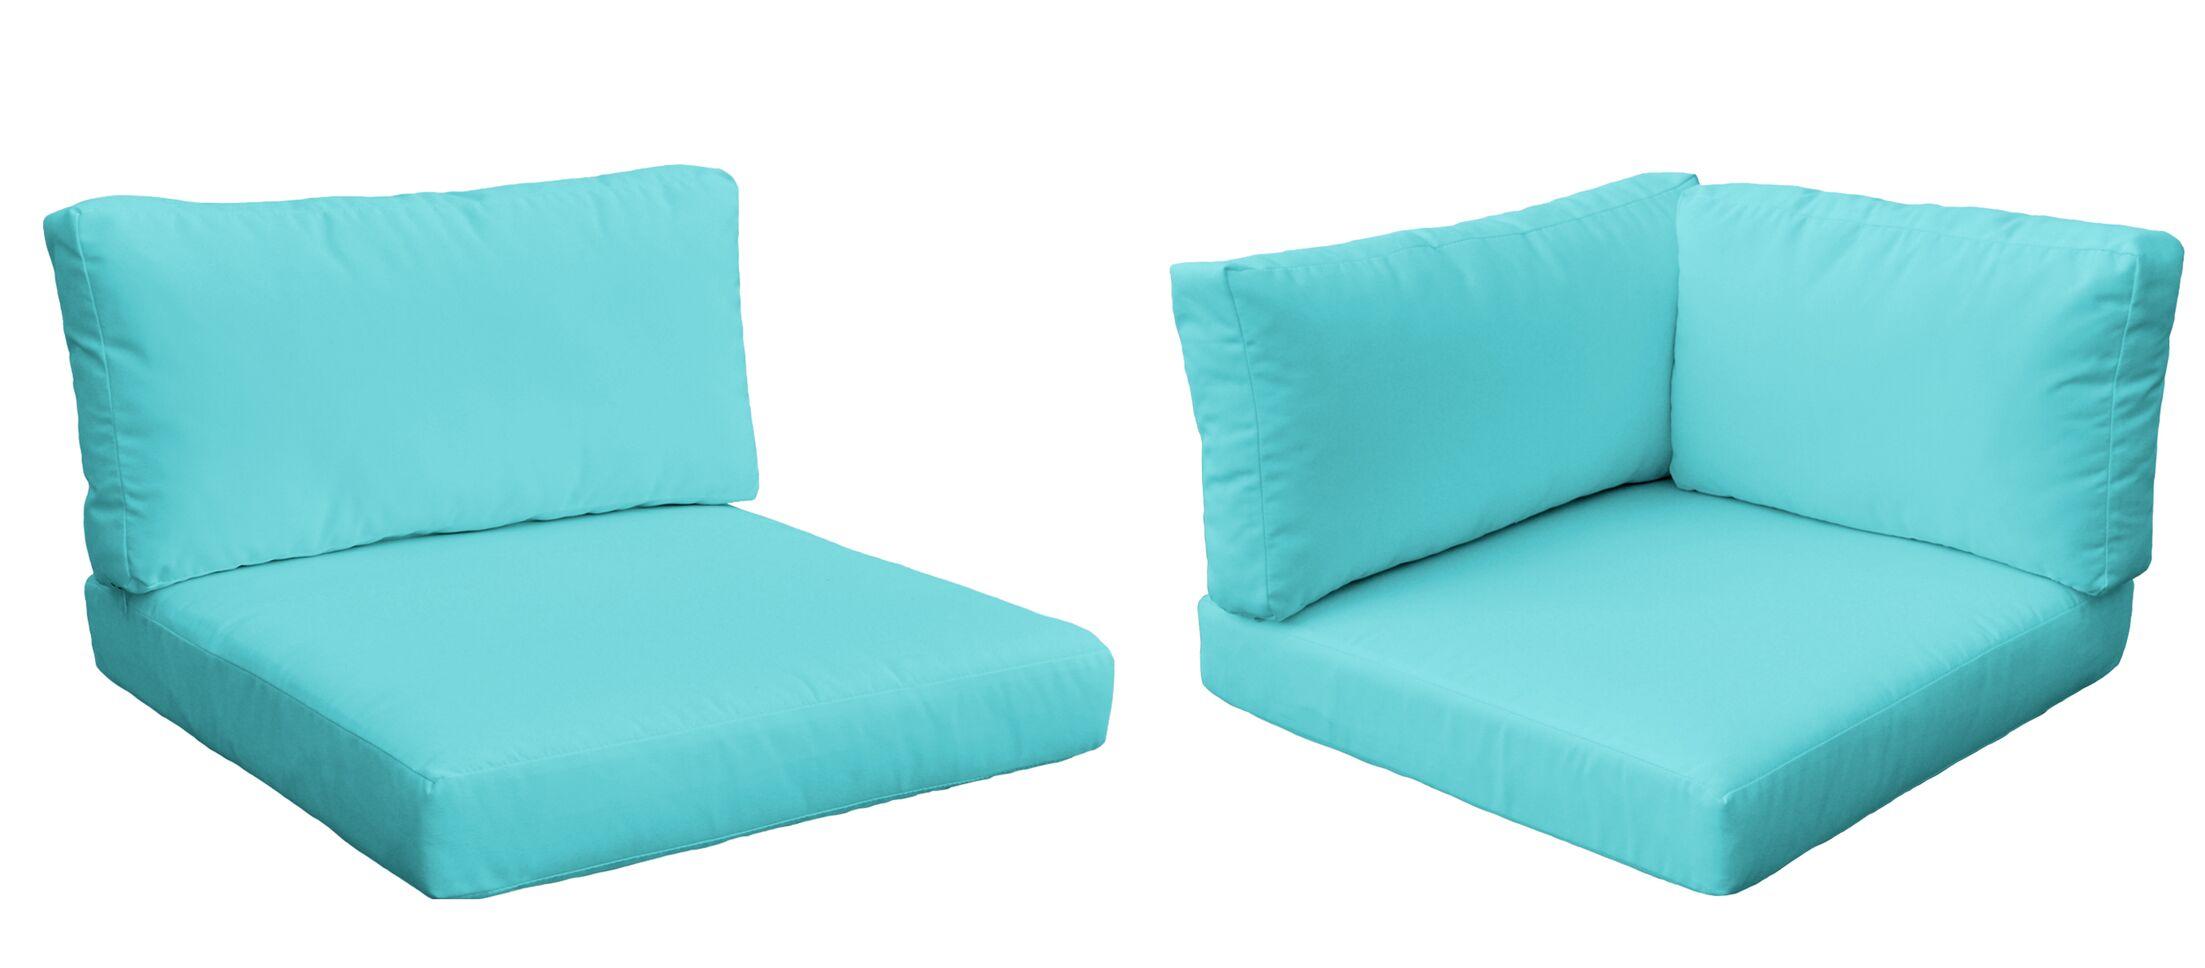 Monaco Outdoor 10 Piece Lounge Chair Cushion Set Fabric: Aruba